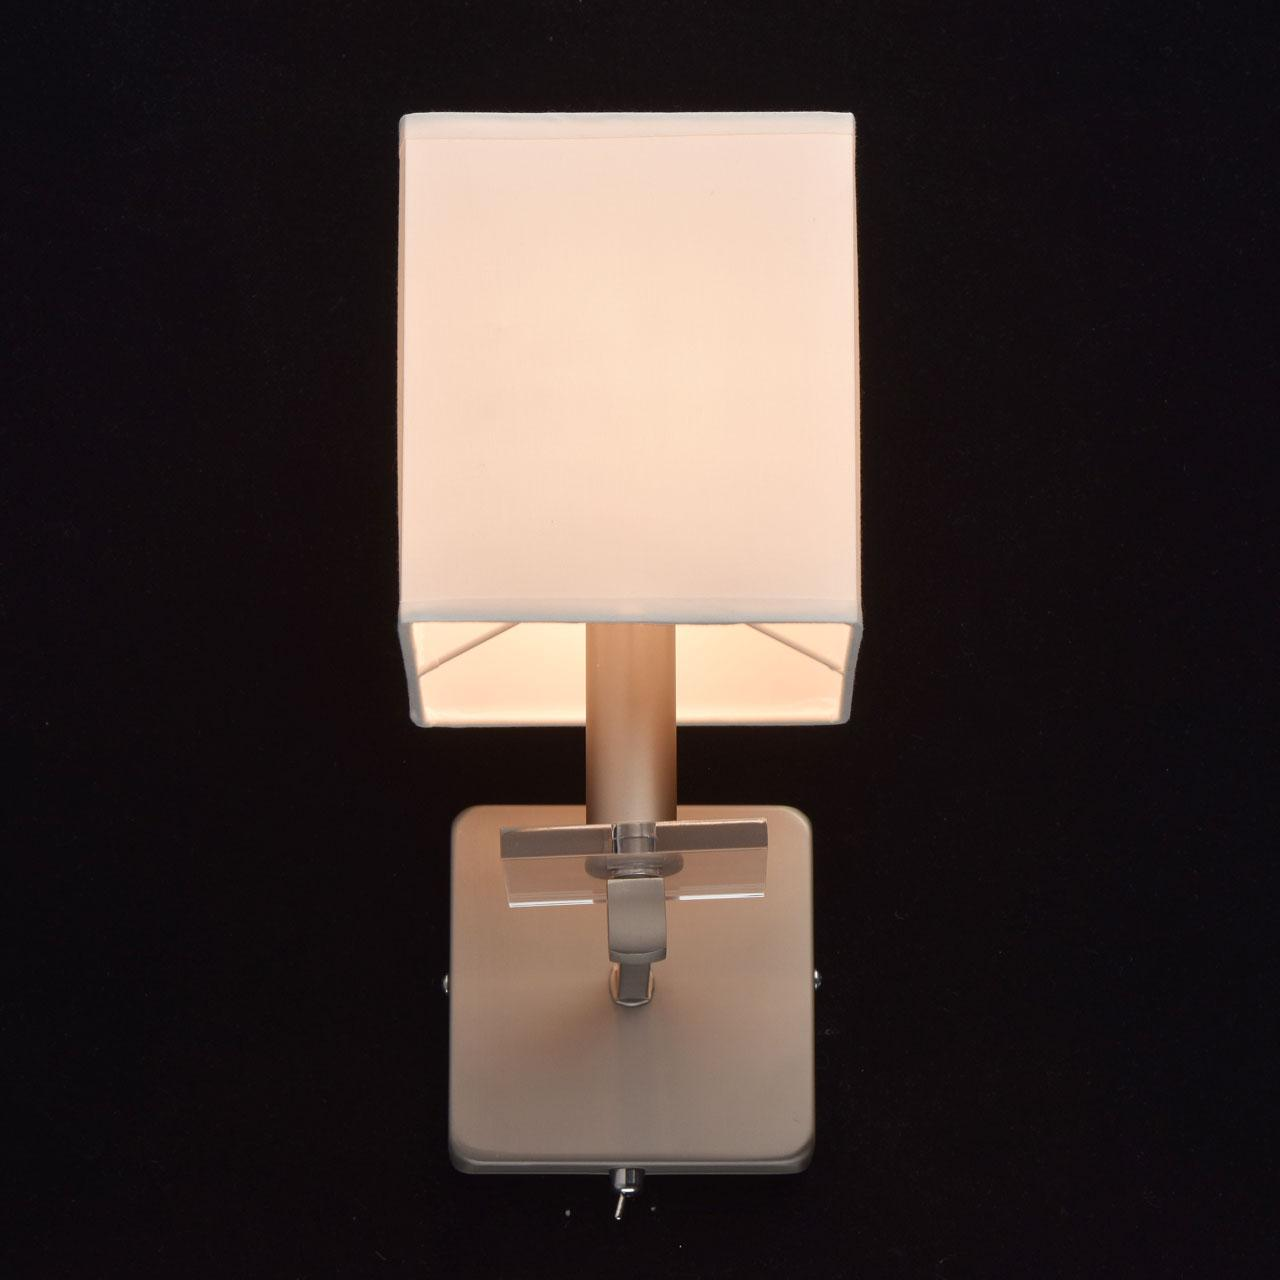 Бра MW-Light Прато 4 101021401 mw light бра mw light прато 101020202